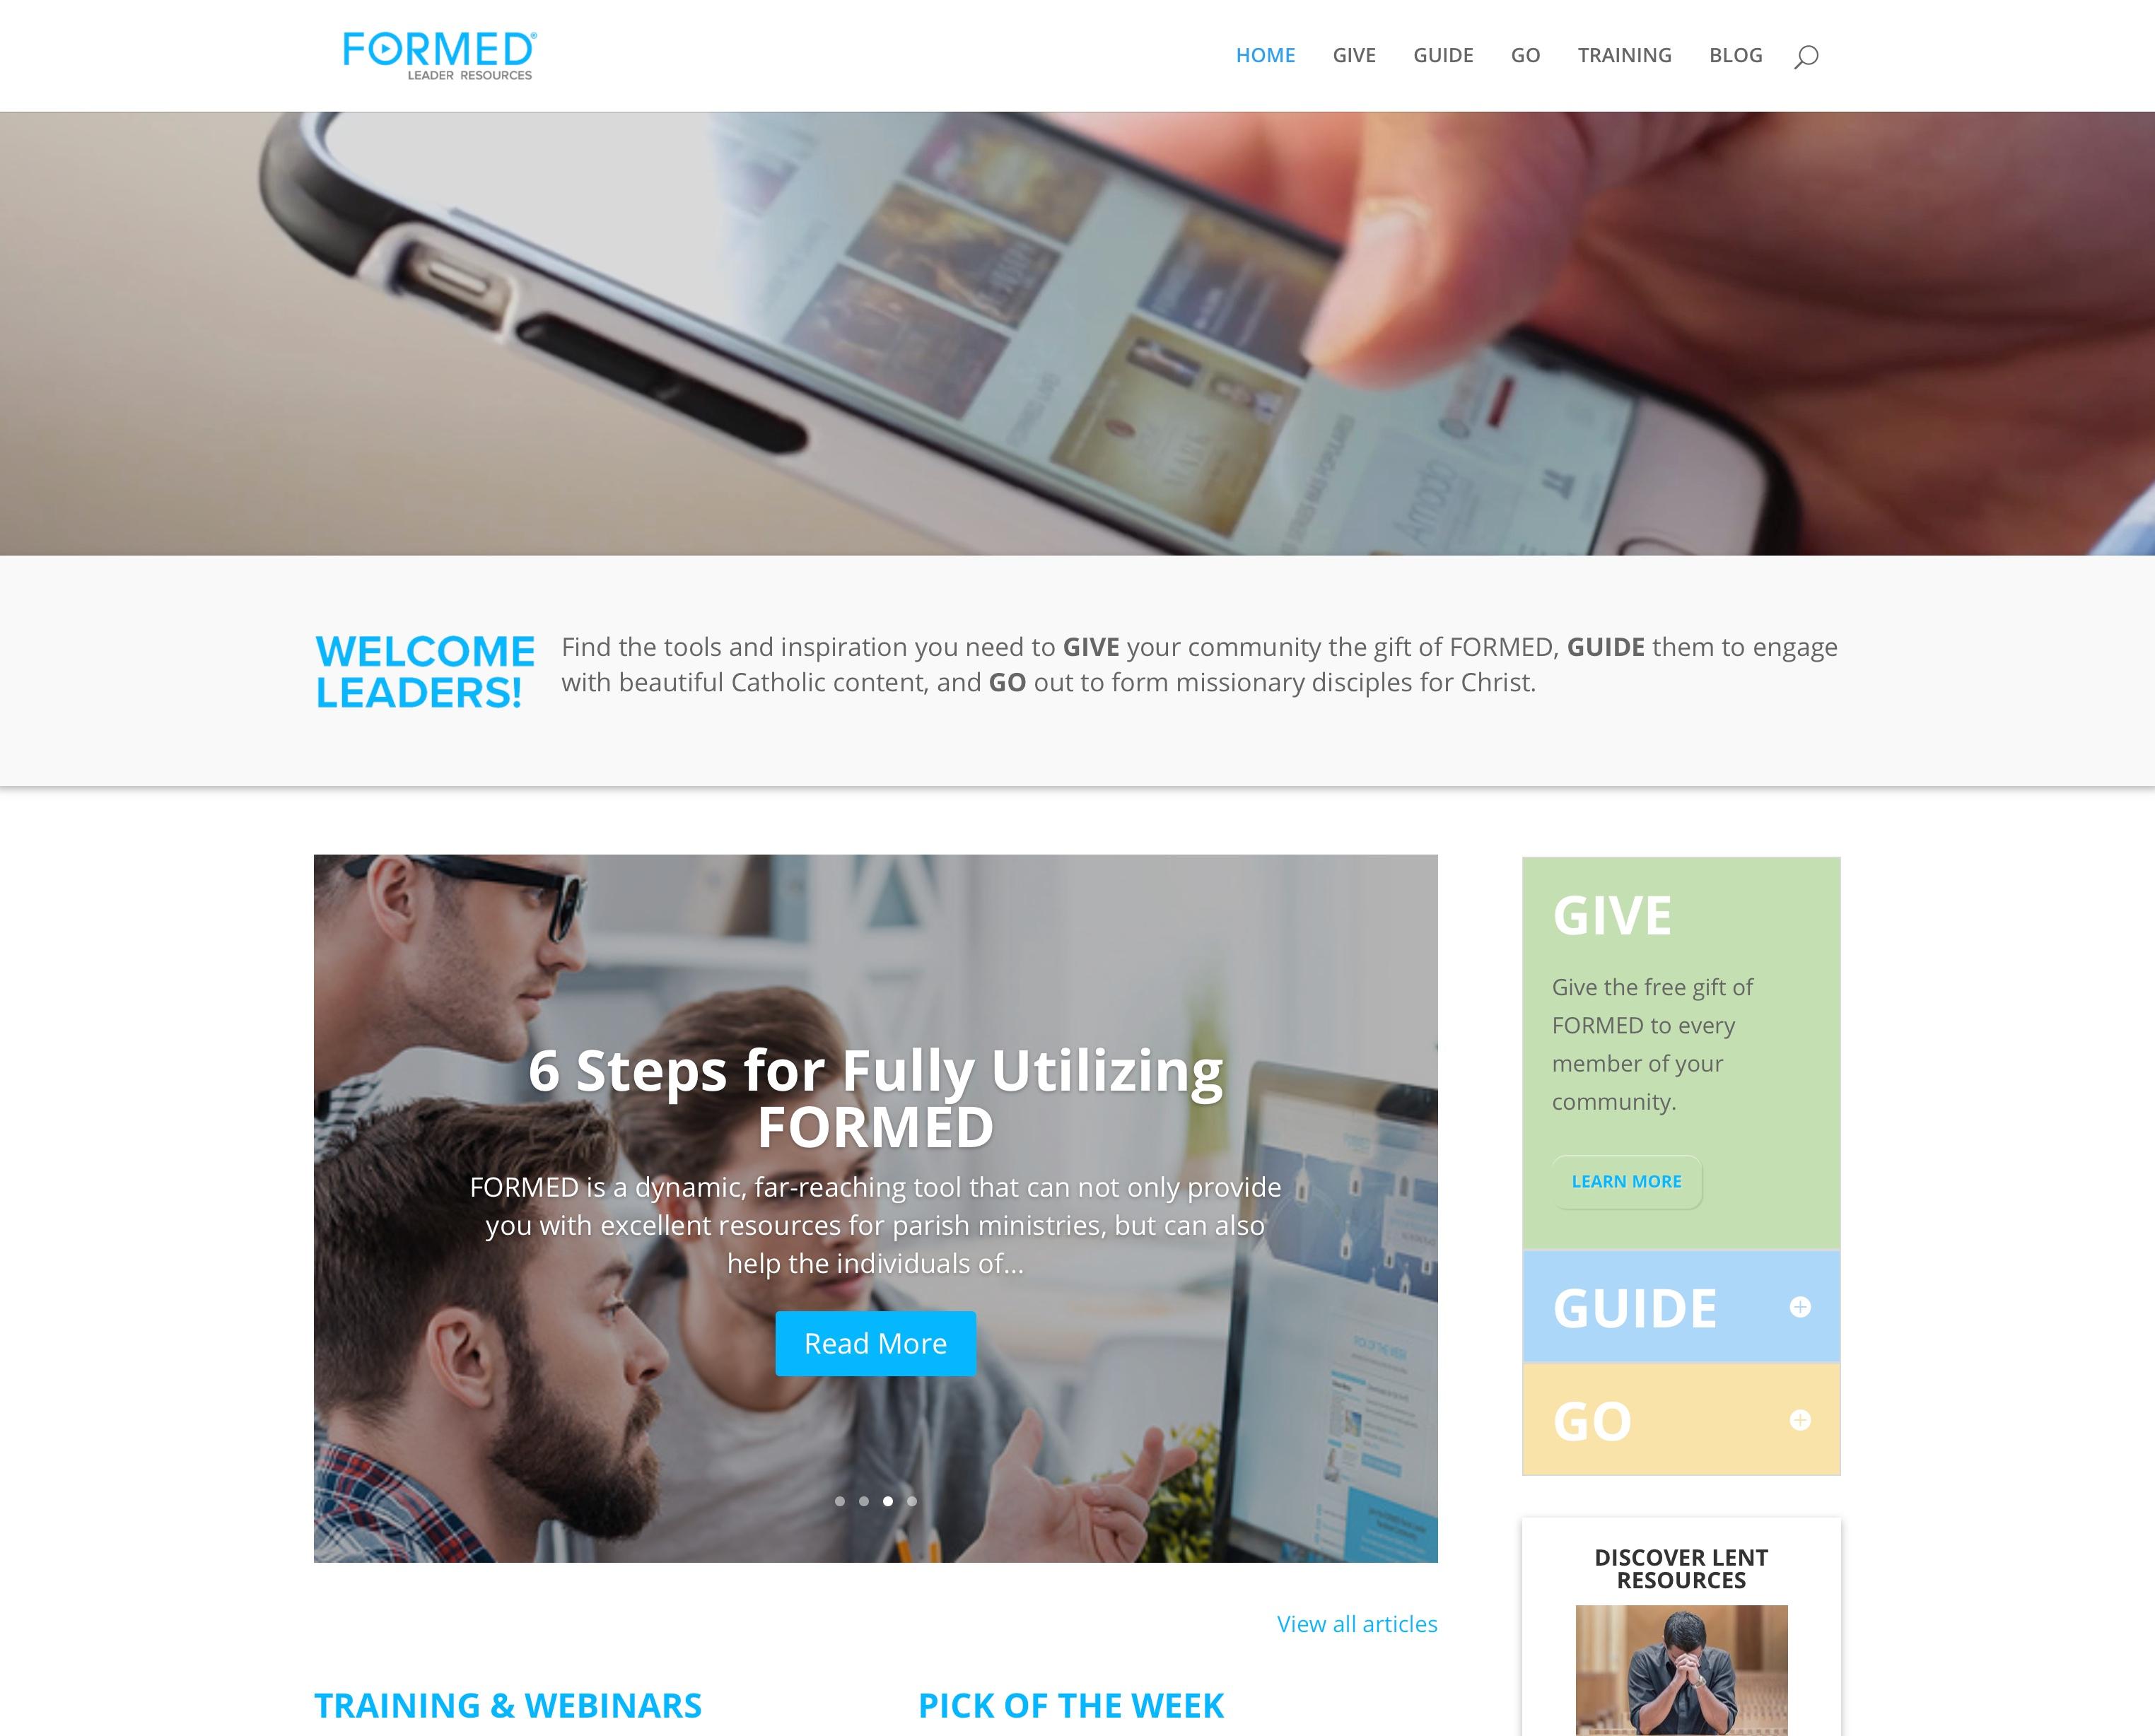 Web Design & Development | JP Creative Group